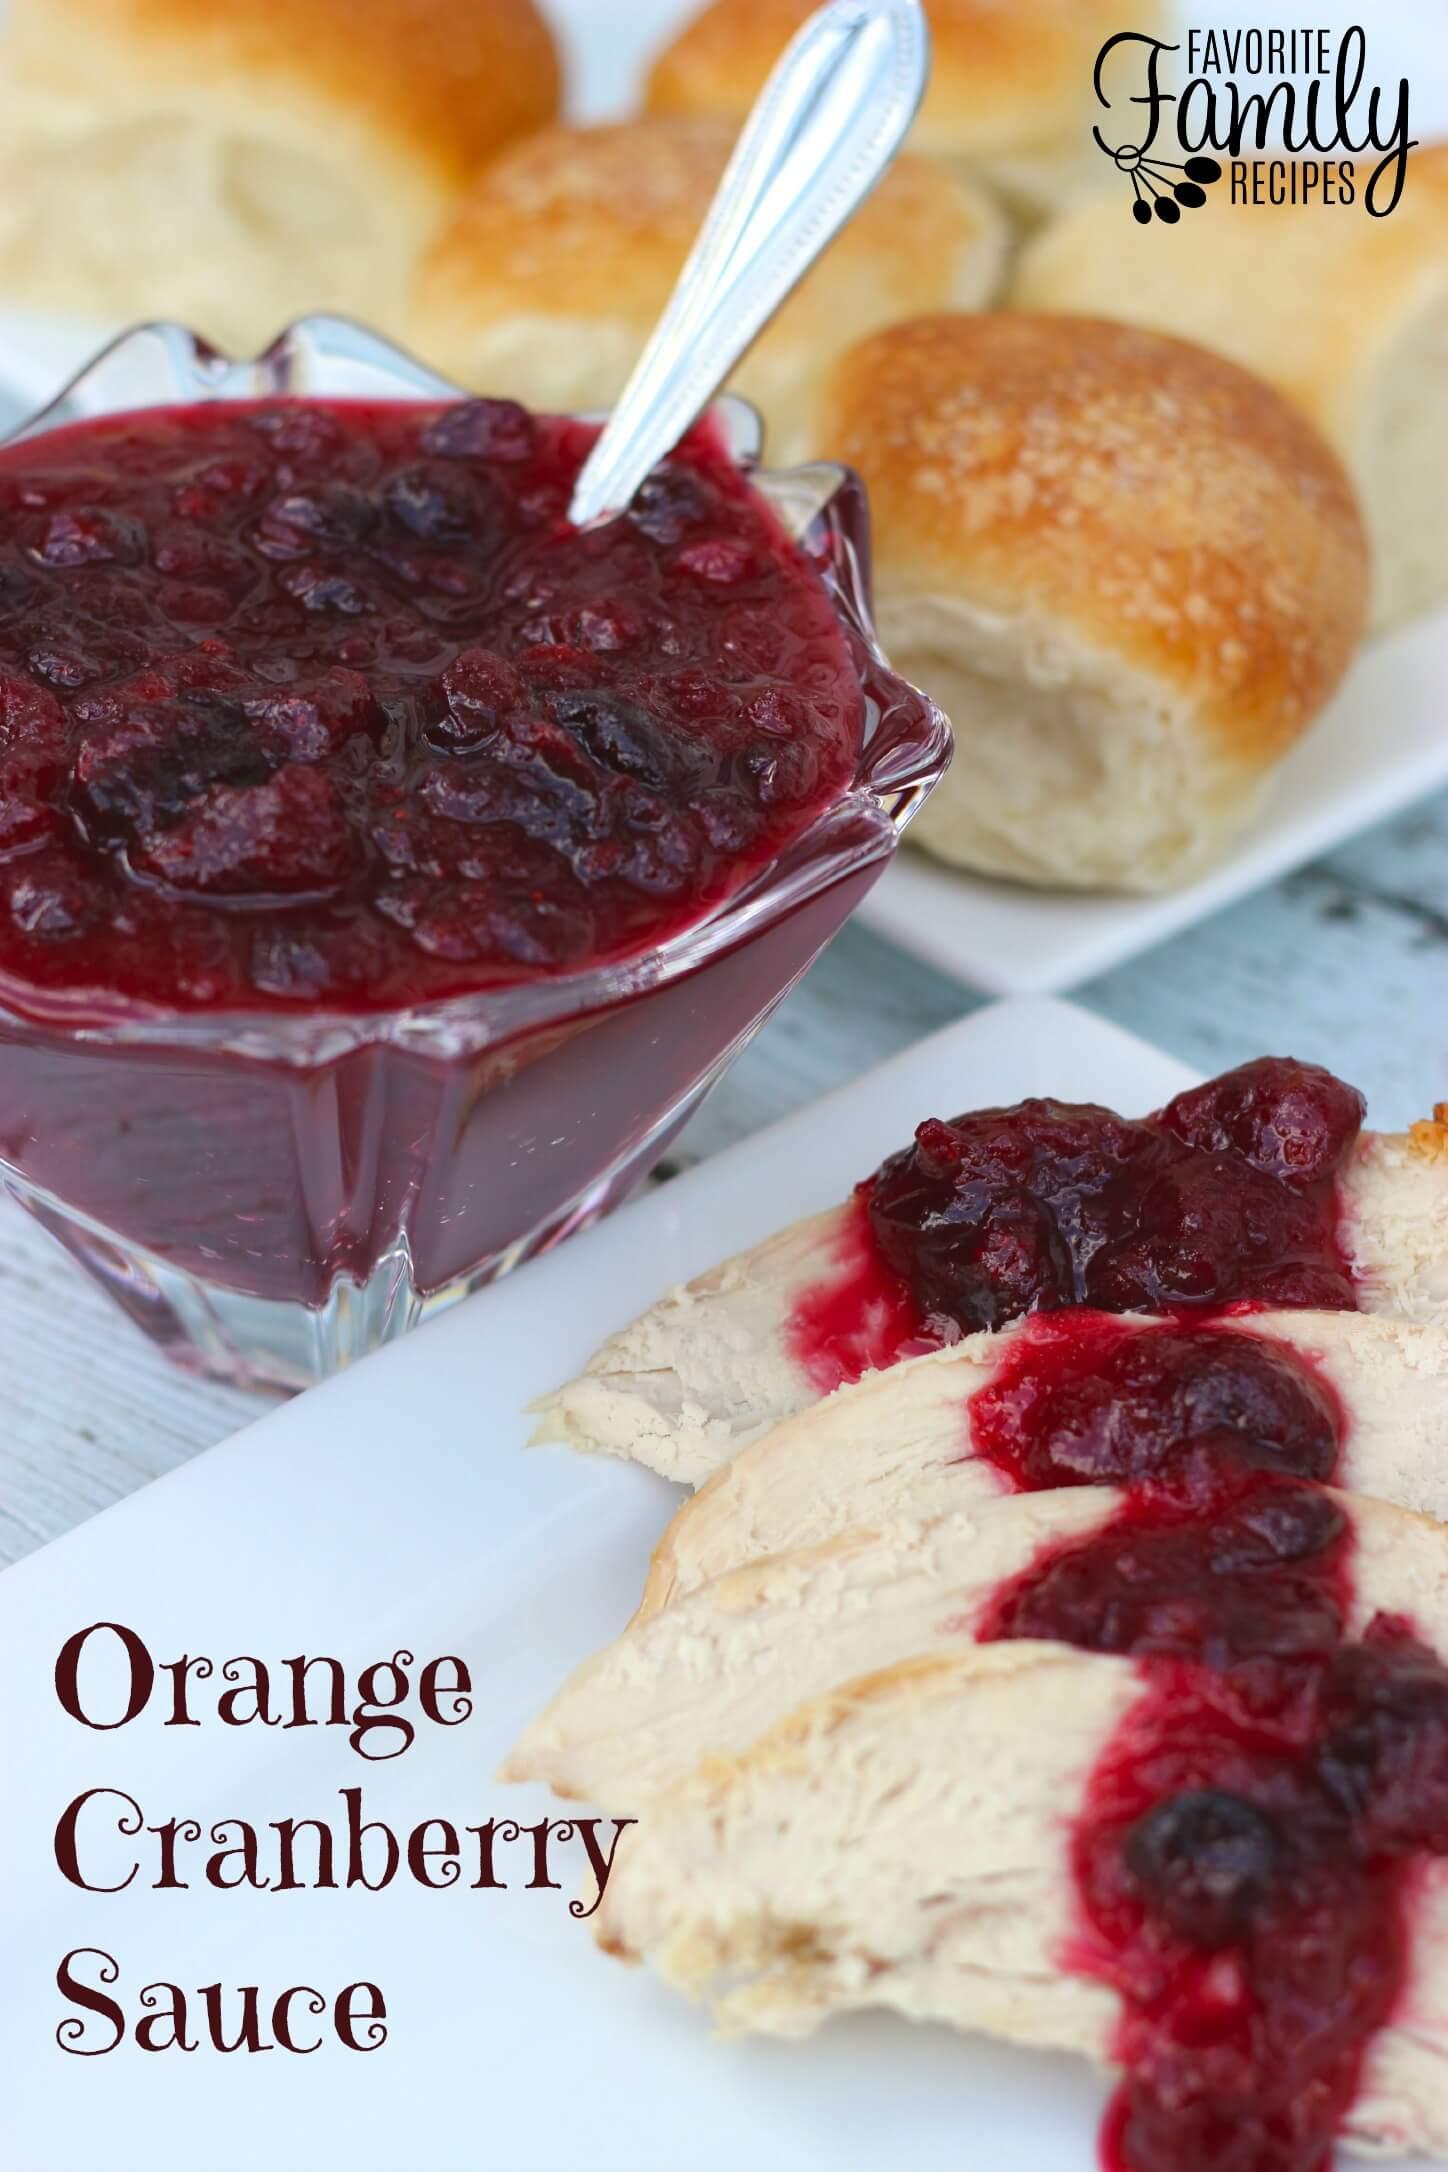 Orange Cranberry Sauce -Favorite Family Recipes